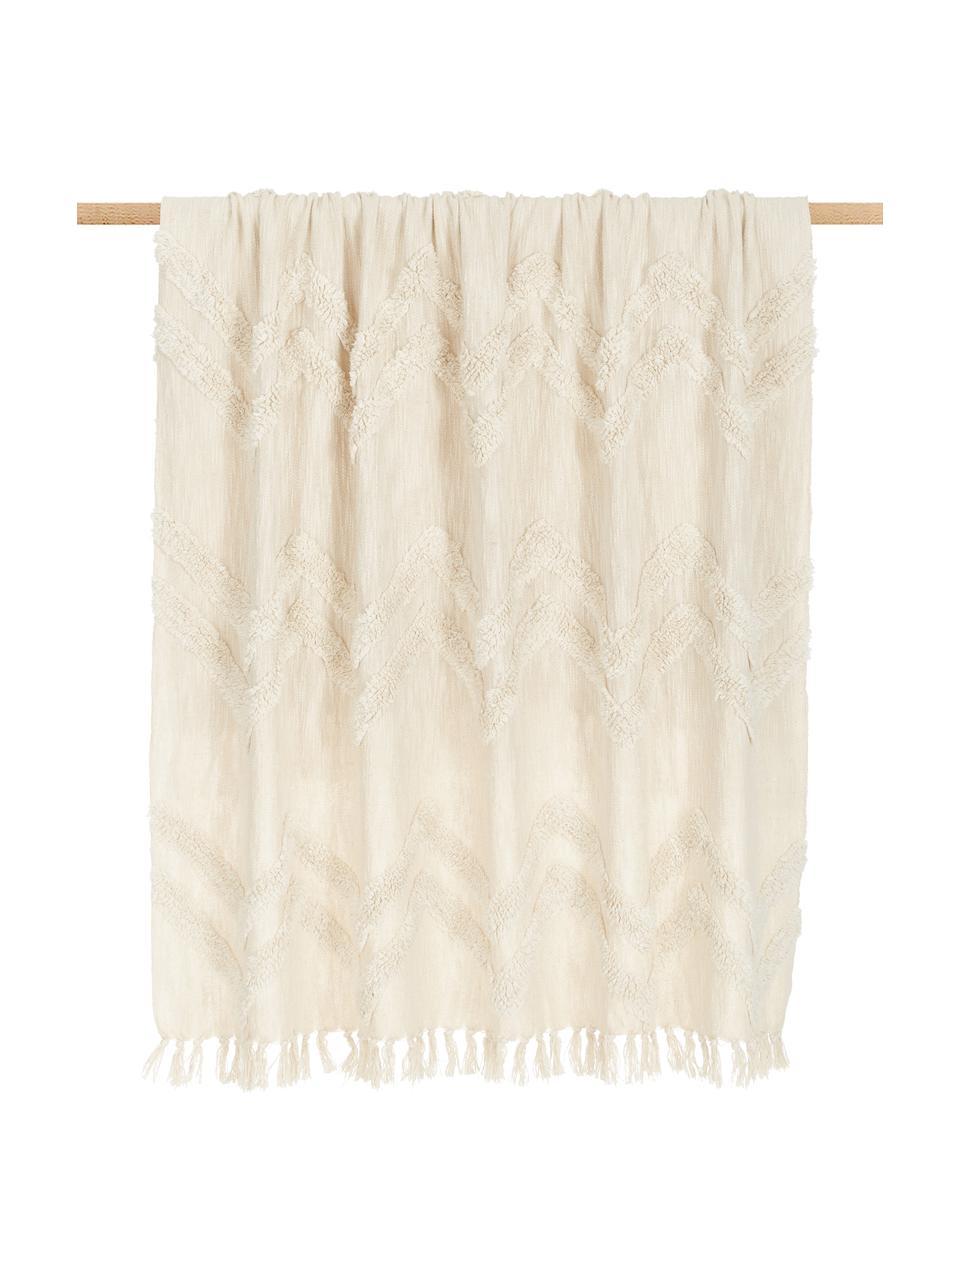 Boho Baumwolldecke Akesha mit getuftetem Zickzack-Muster, 100% Baumwolle, Ecru, 130 x 170 cm